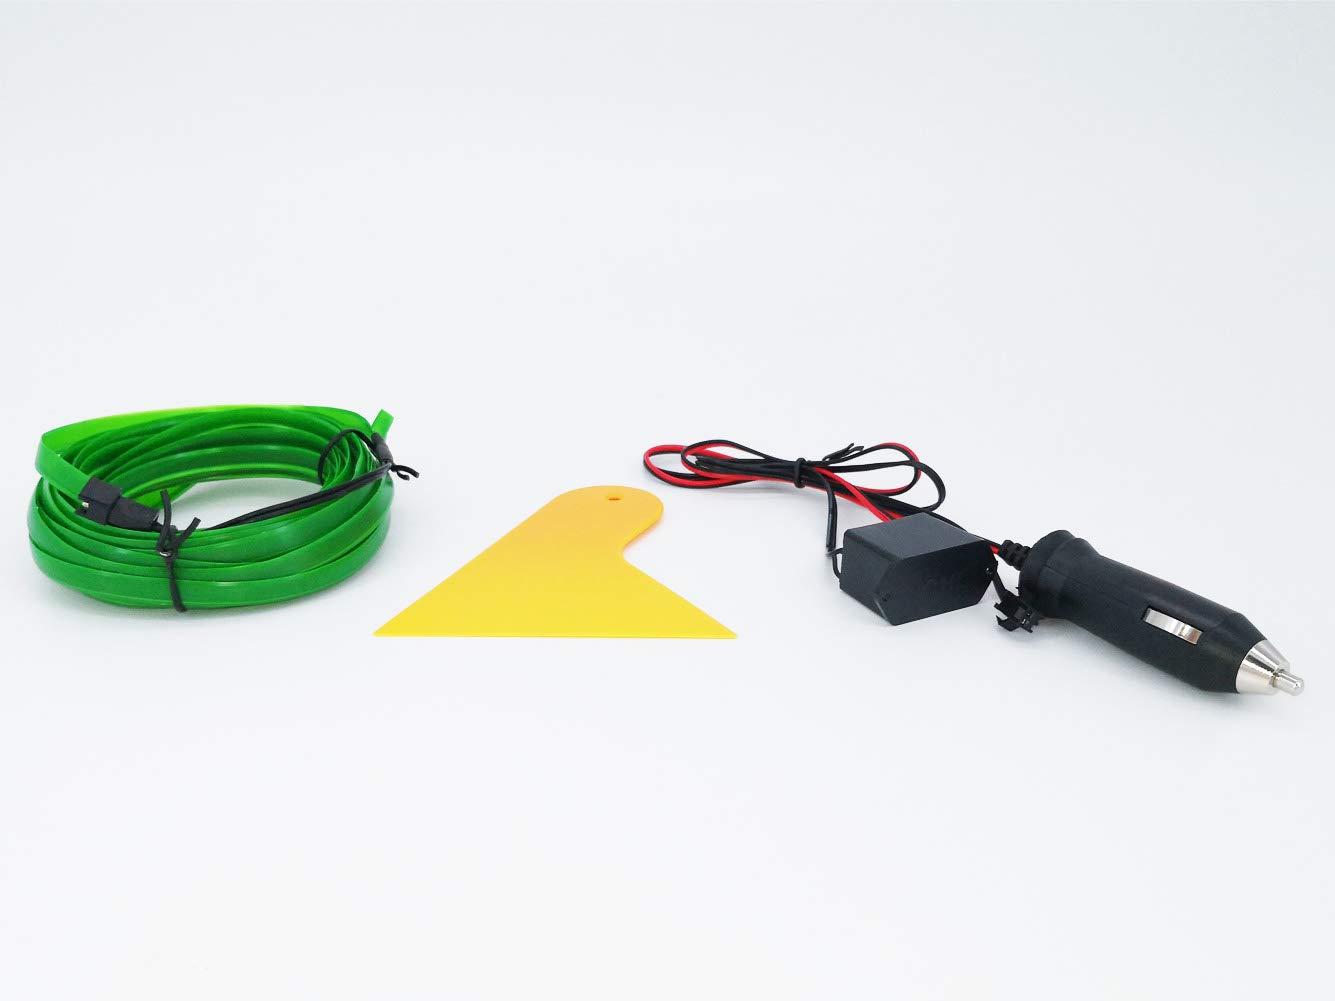 Rojo El Wire Car 3m//9ft Luz de ne/ón 12V LED Luces fr/ías L/ámparas autom/áticas flexibles de ne/ón EL Wire para decoraciones de autom/óviles de boda